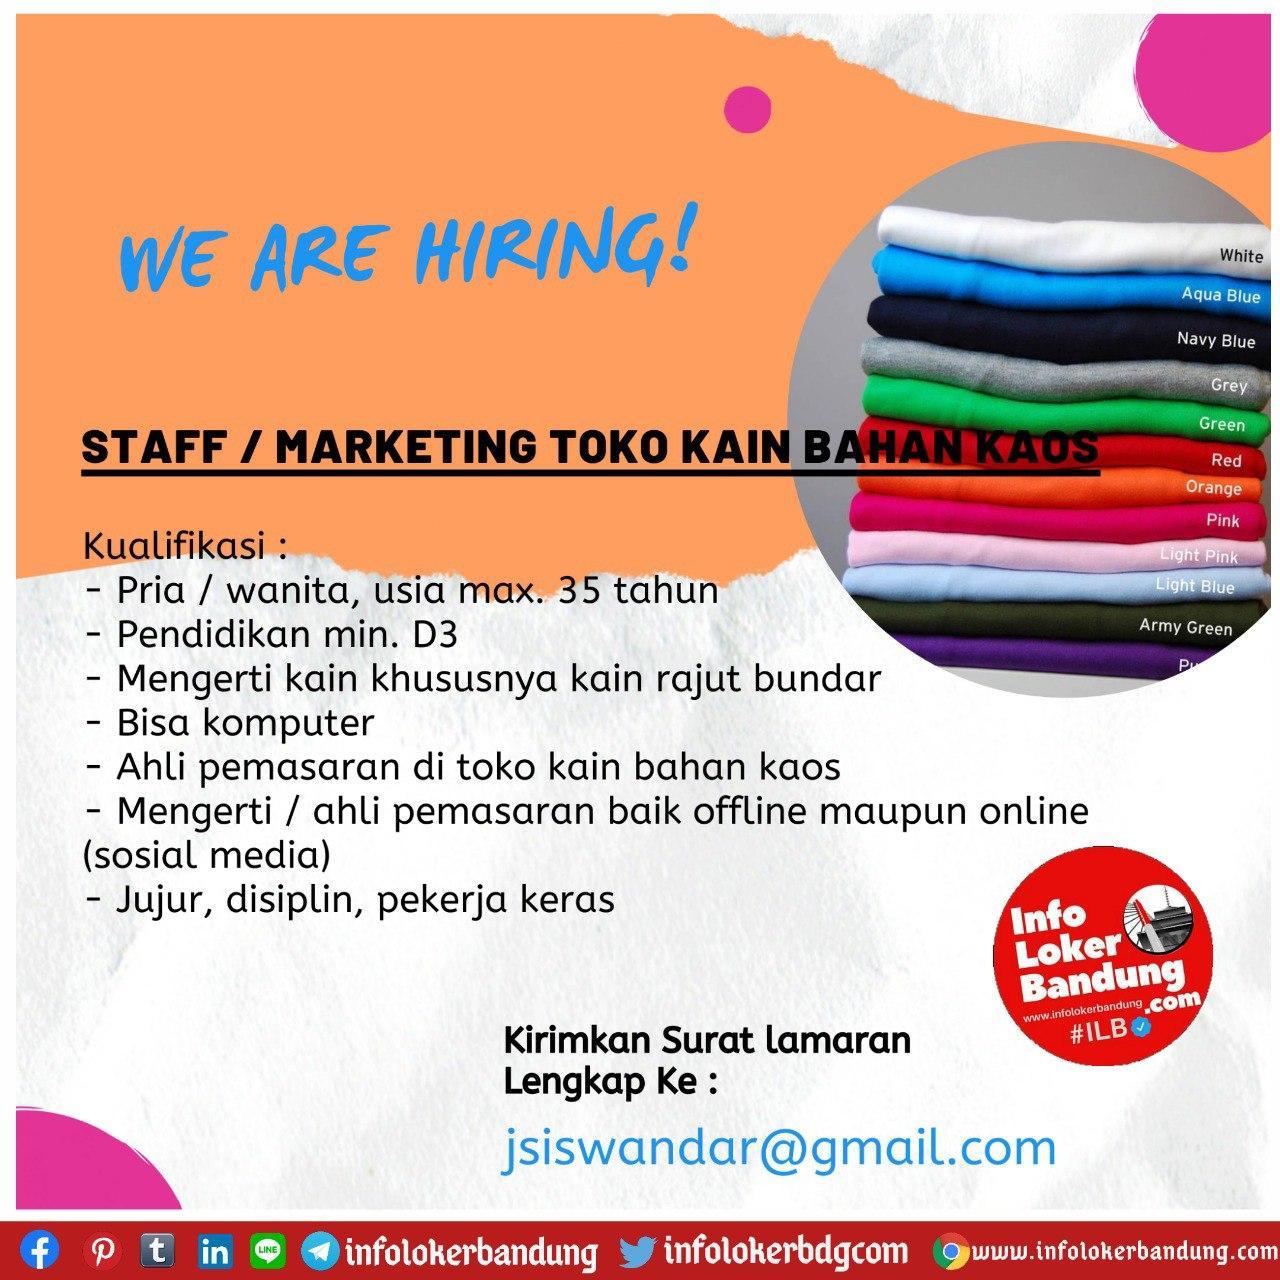 Lowongan Kerja Staff / Marketing Toko Kain Bahan Kaos Bandung Agustus 2020